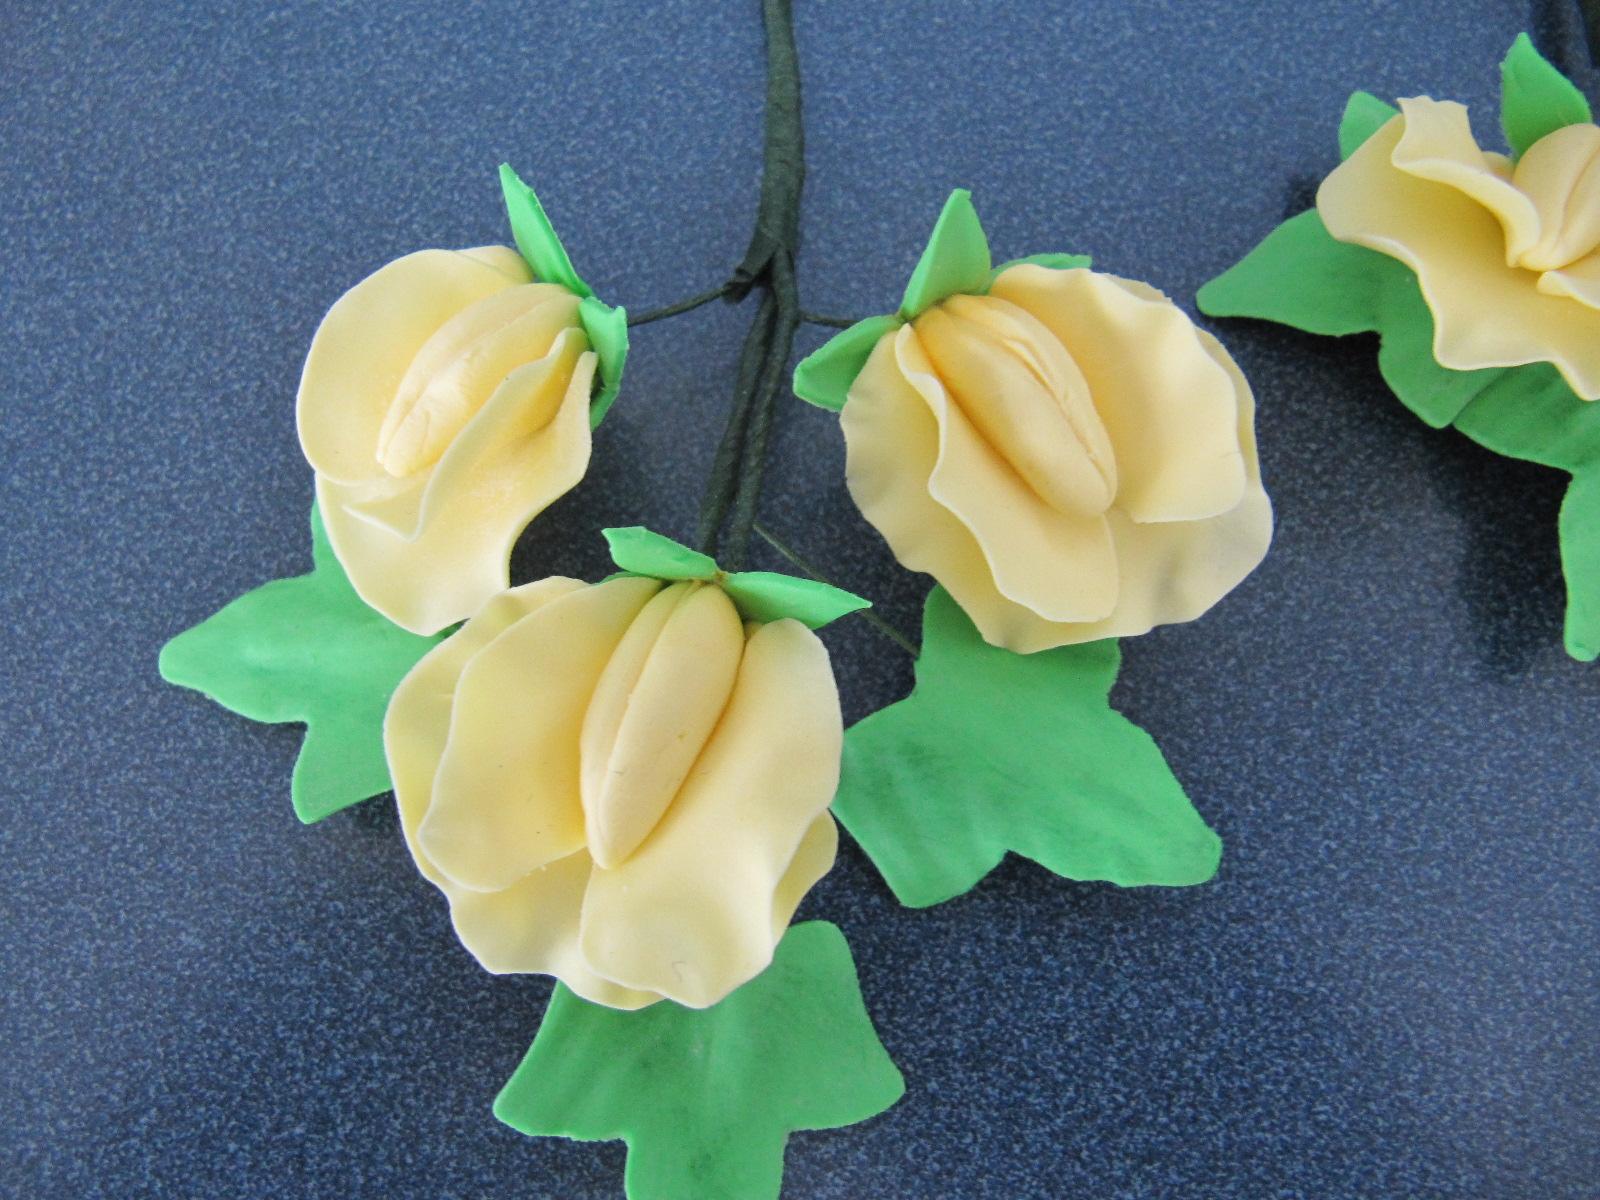 Wilton Advanced Gum Paste Flowers – Erica s Edibles